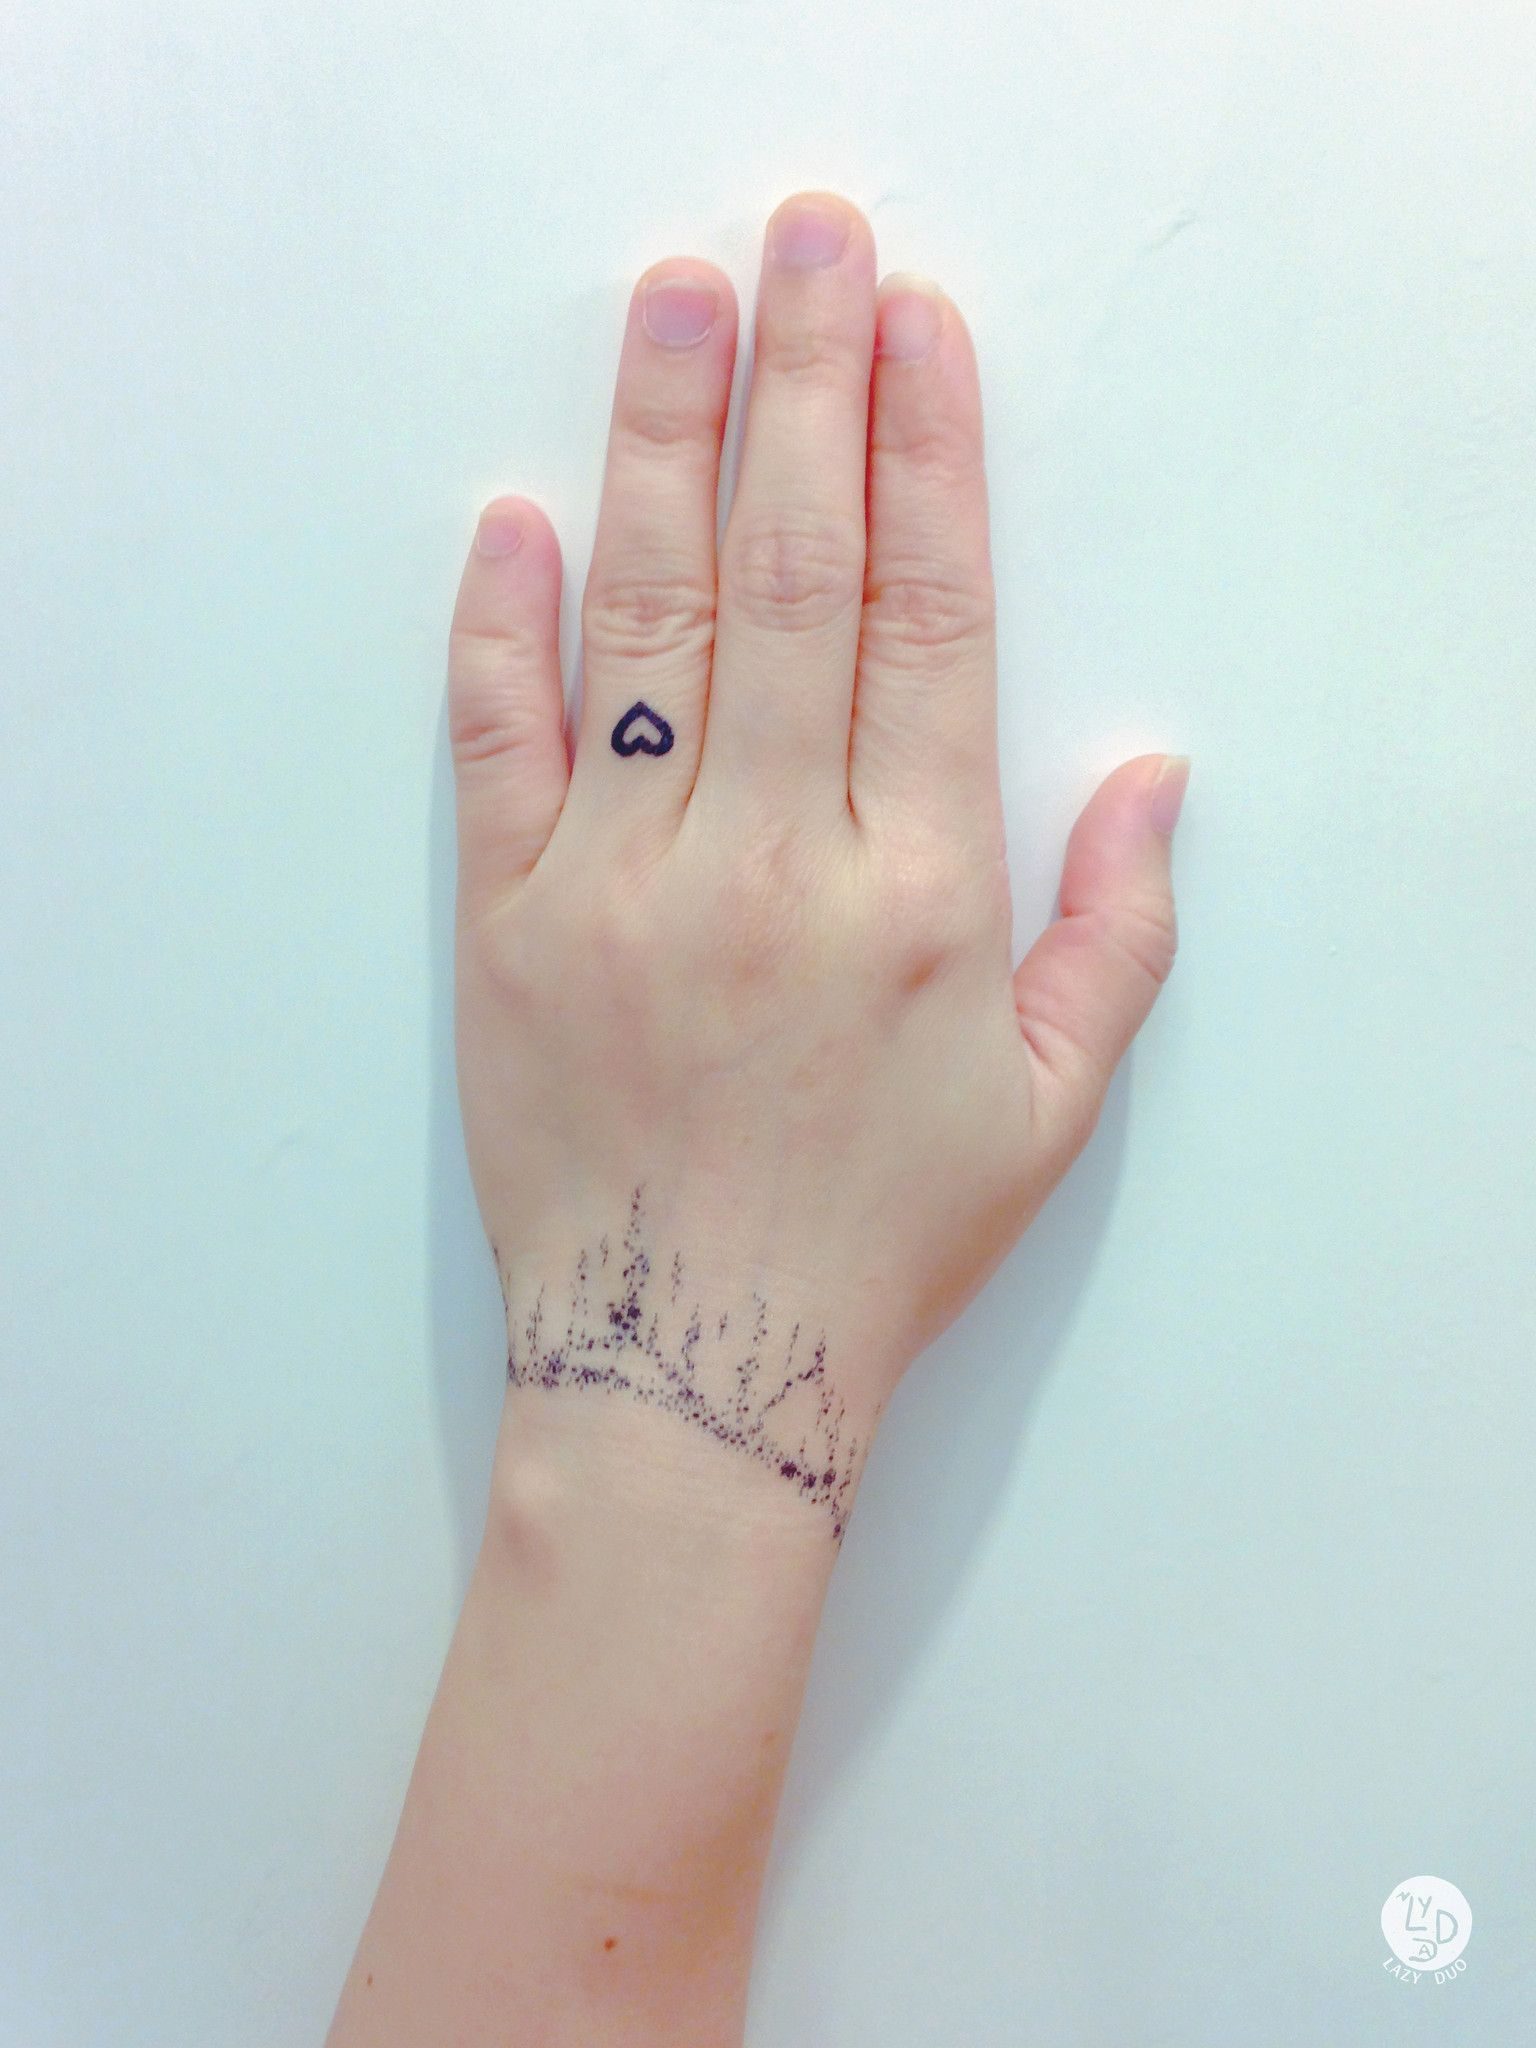 Crystal Bracelet Tattoo Tattoo Bracelet Tattoos Foot Tattoos